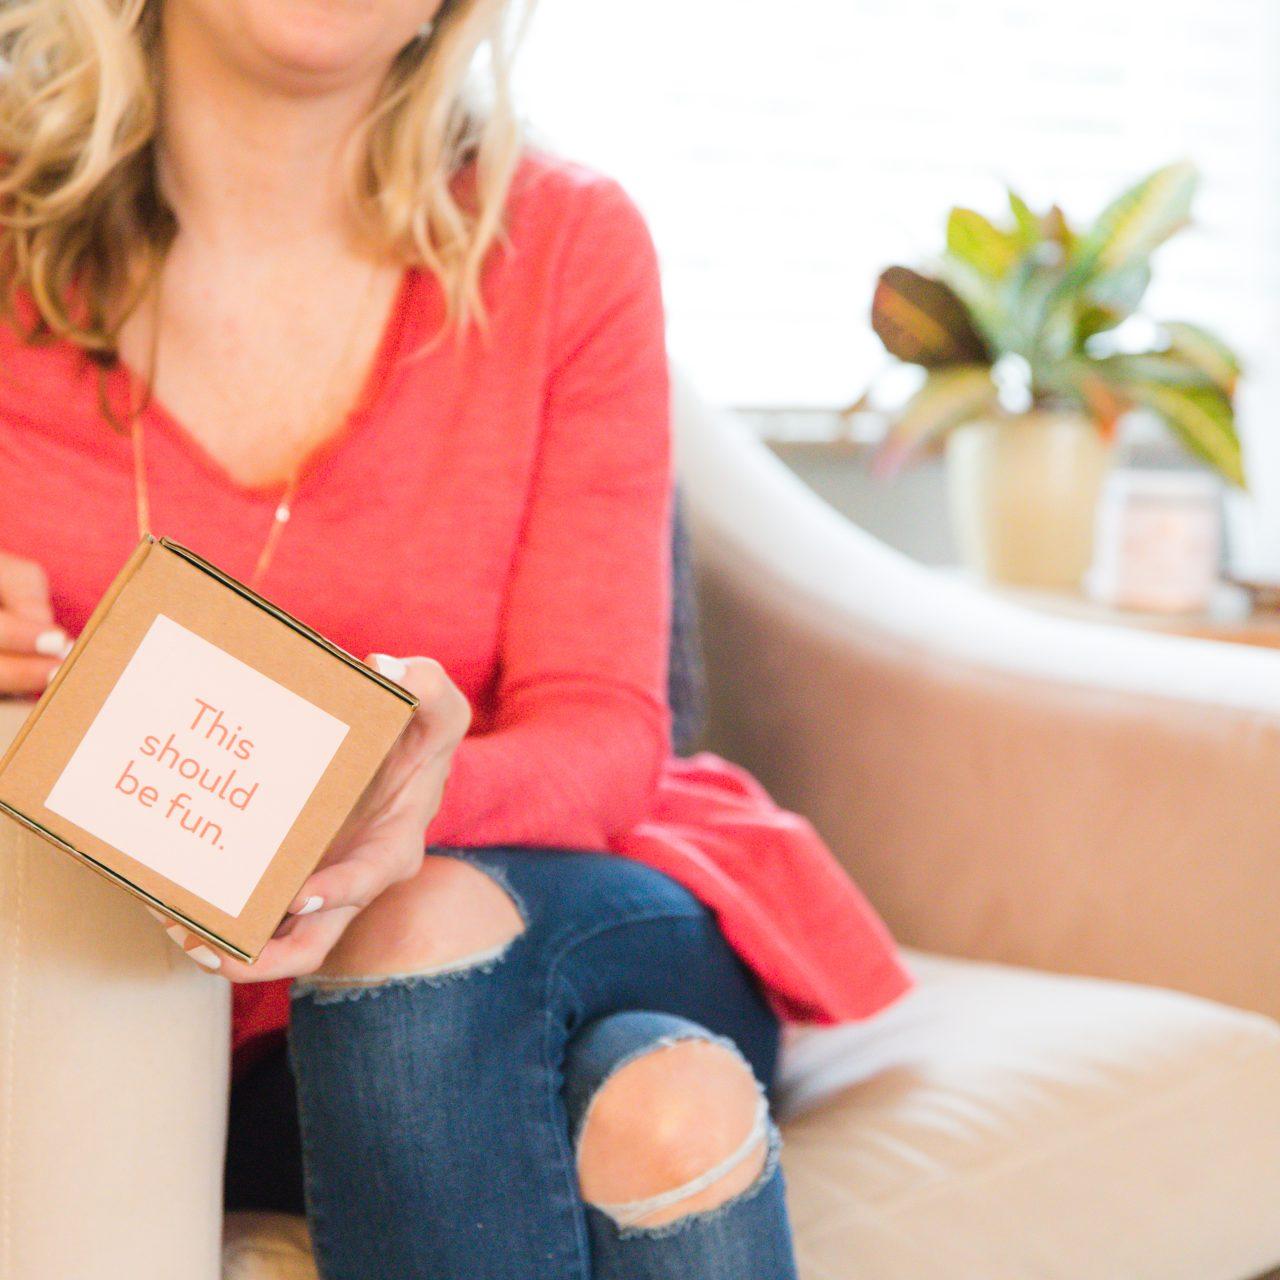 Greetabl – A Personalized Gift Box